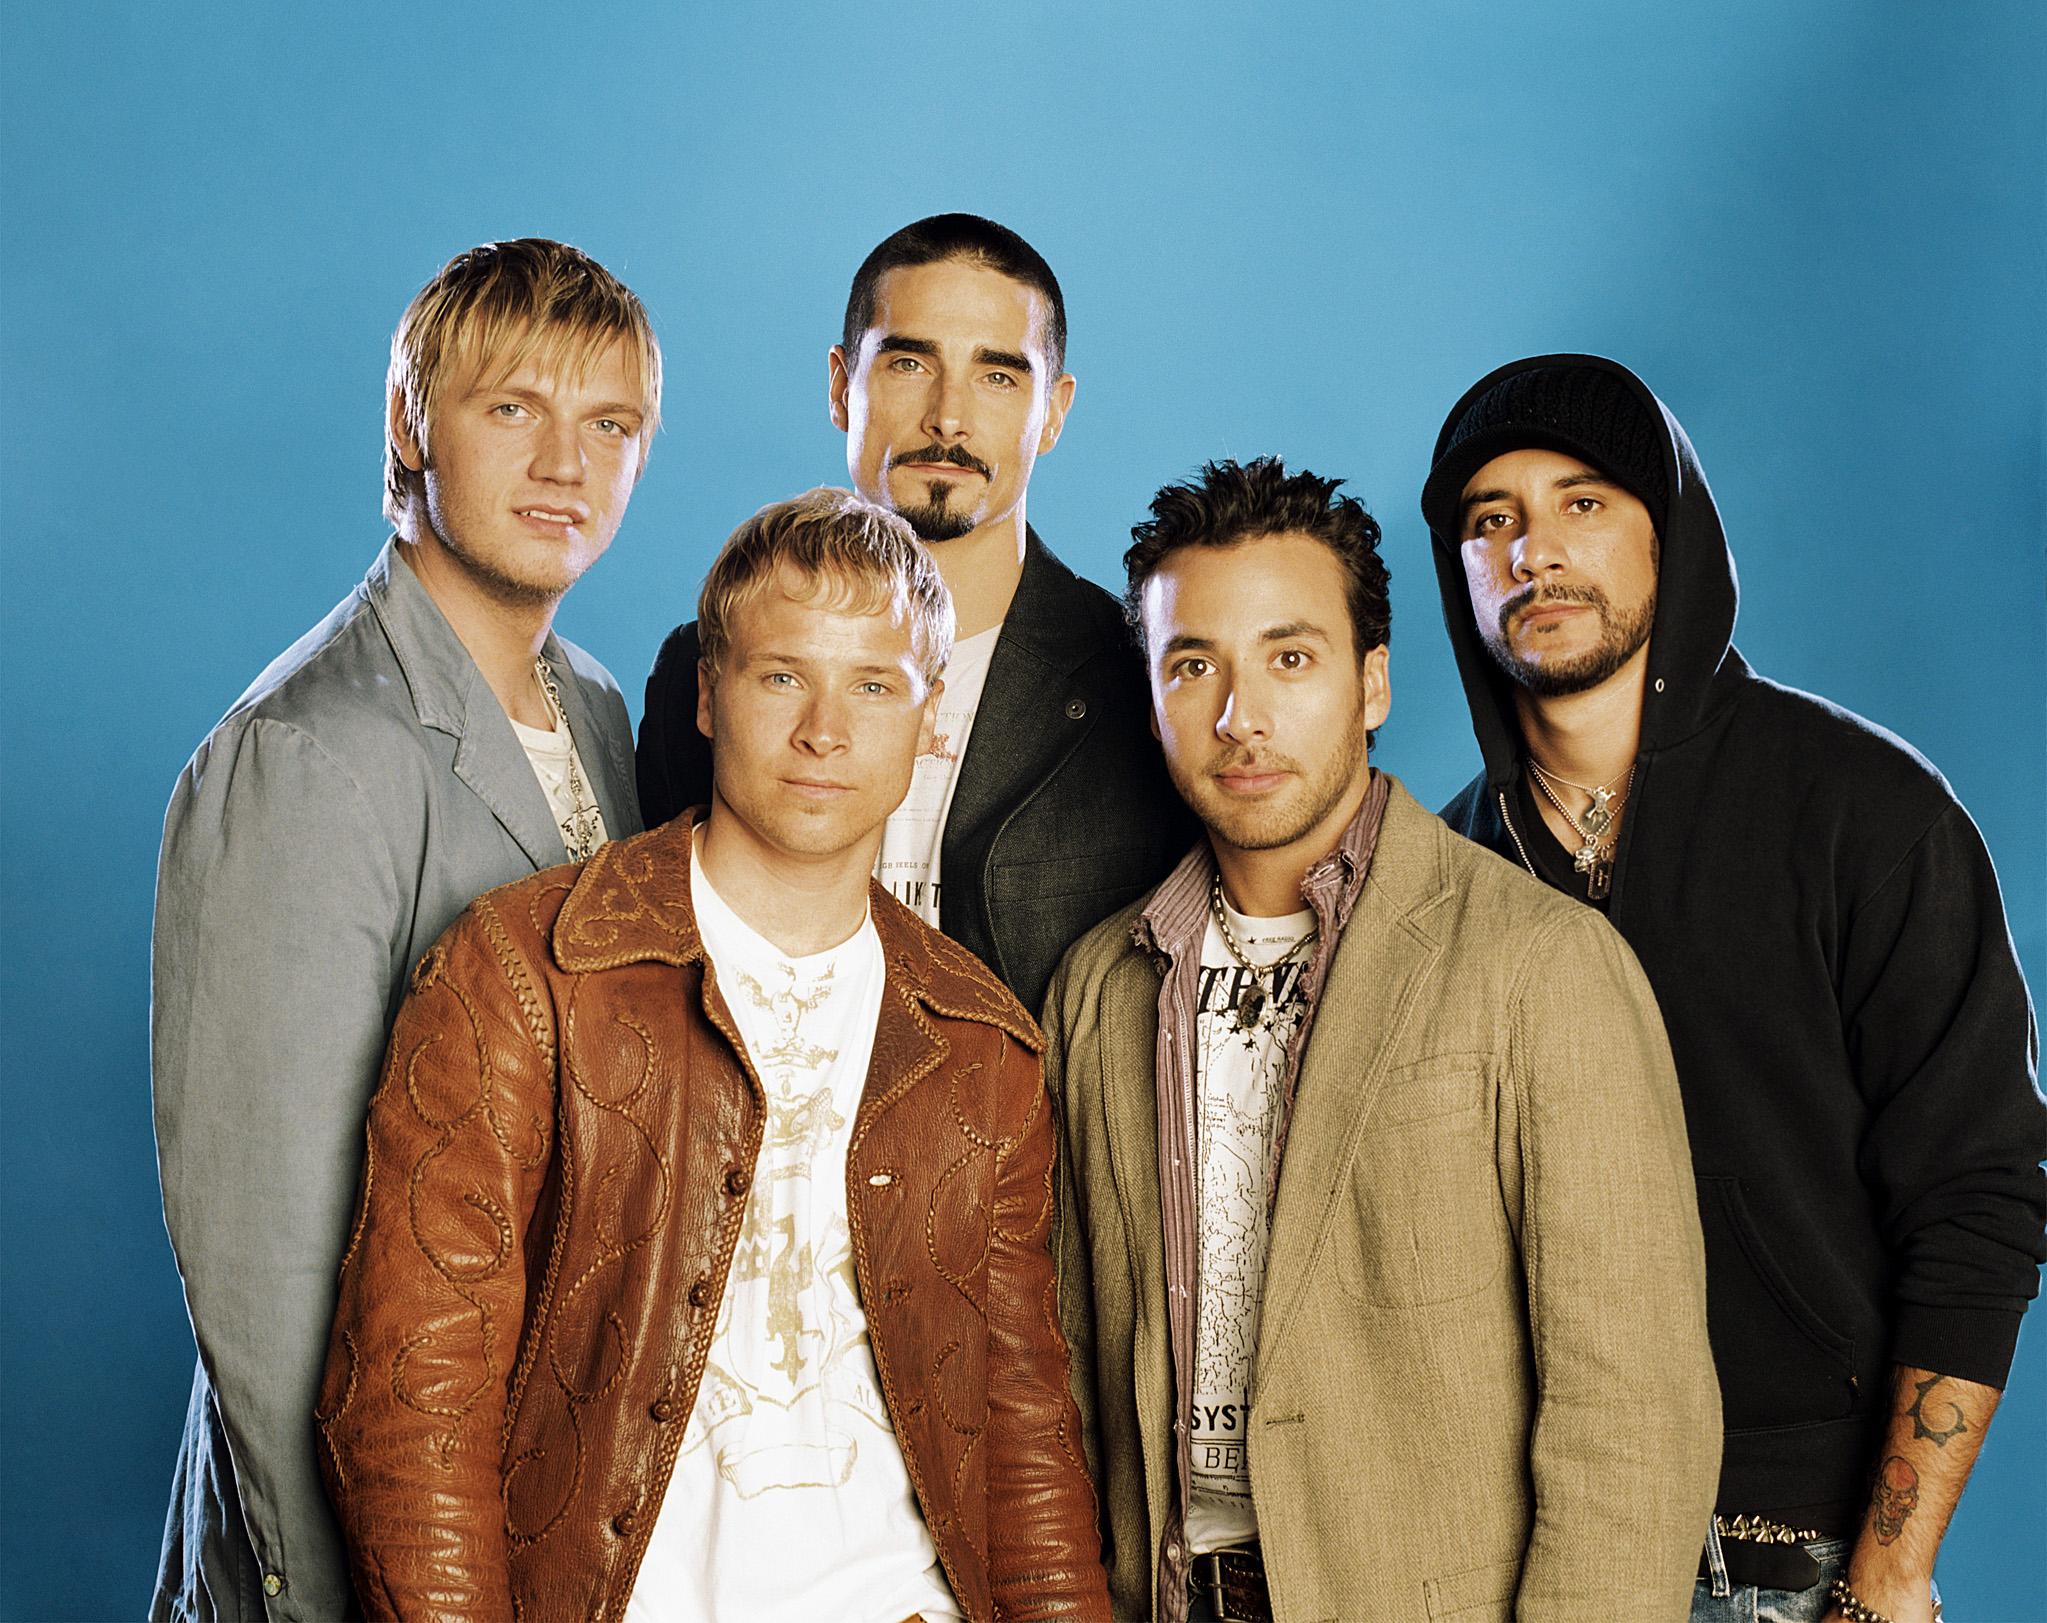 backstreet boys - photo #8